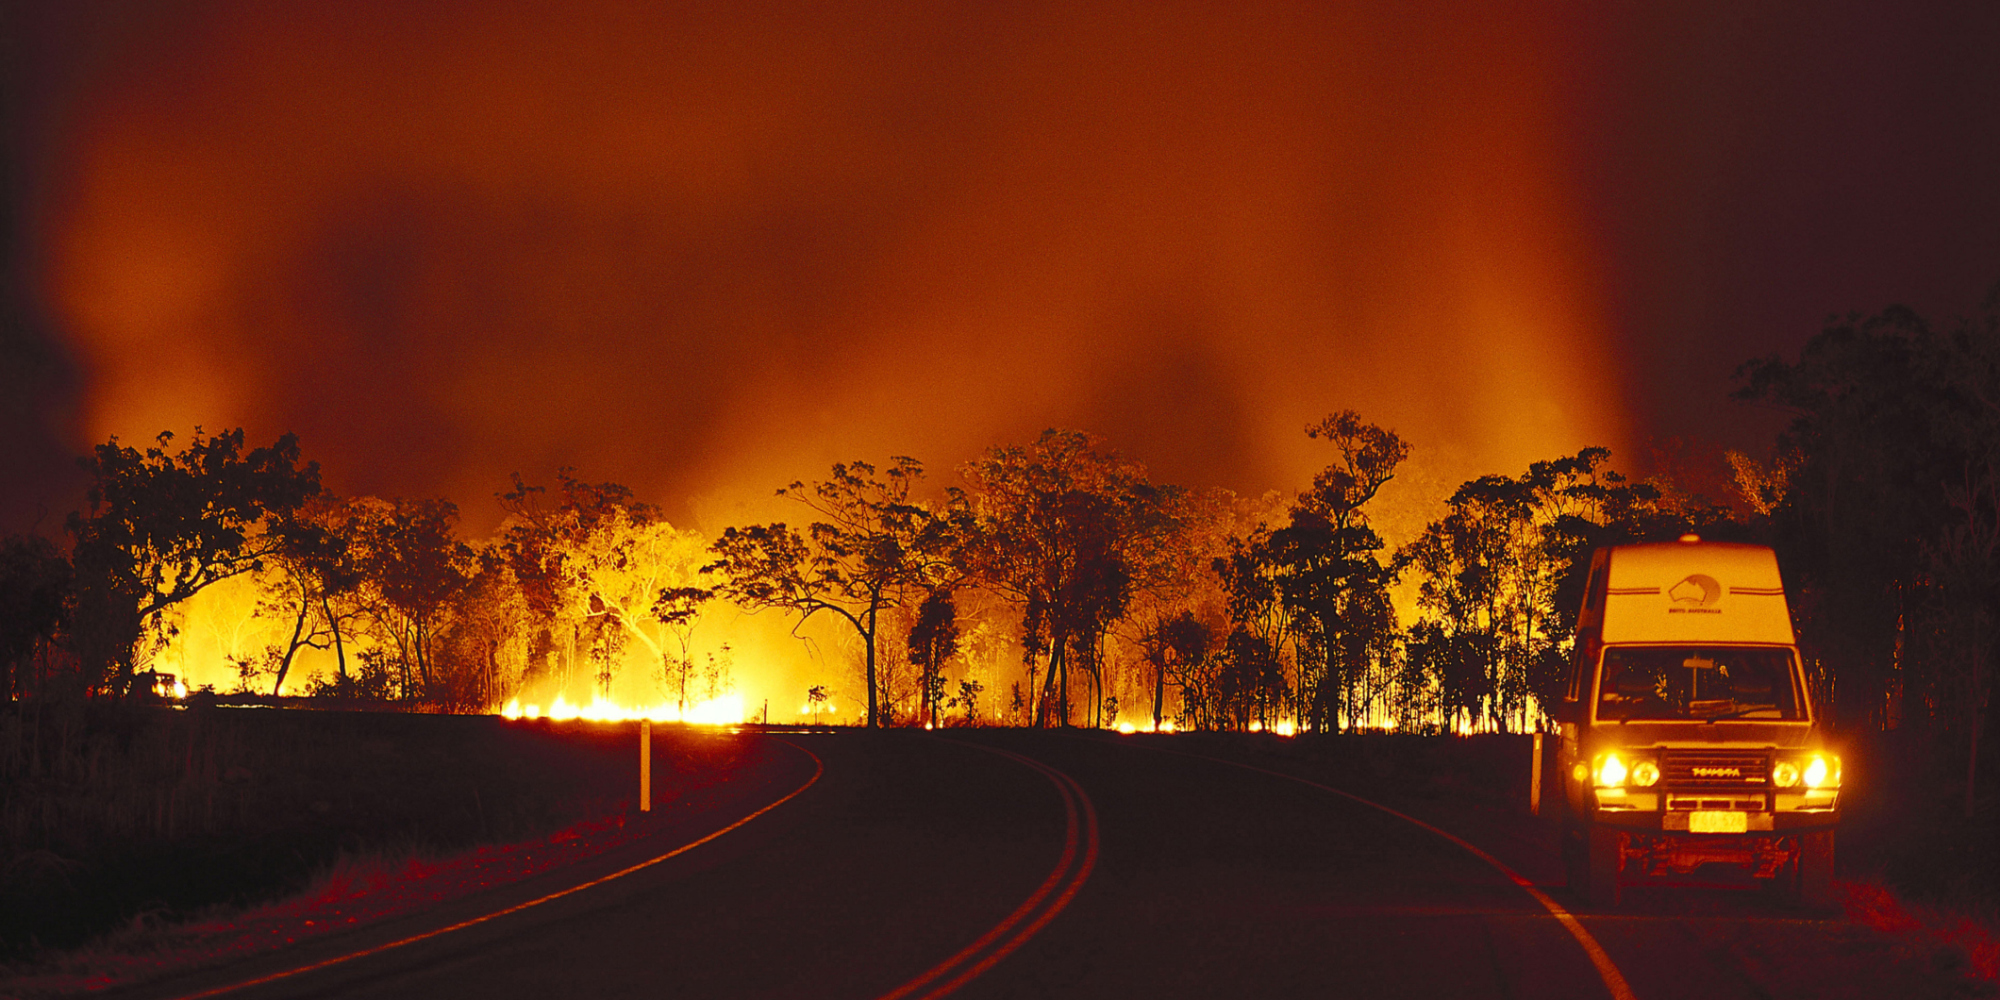 bushfire - photo #14